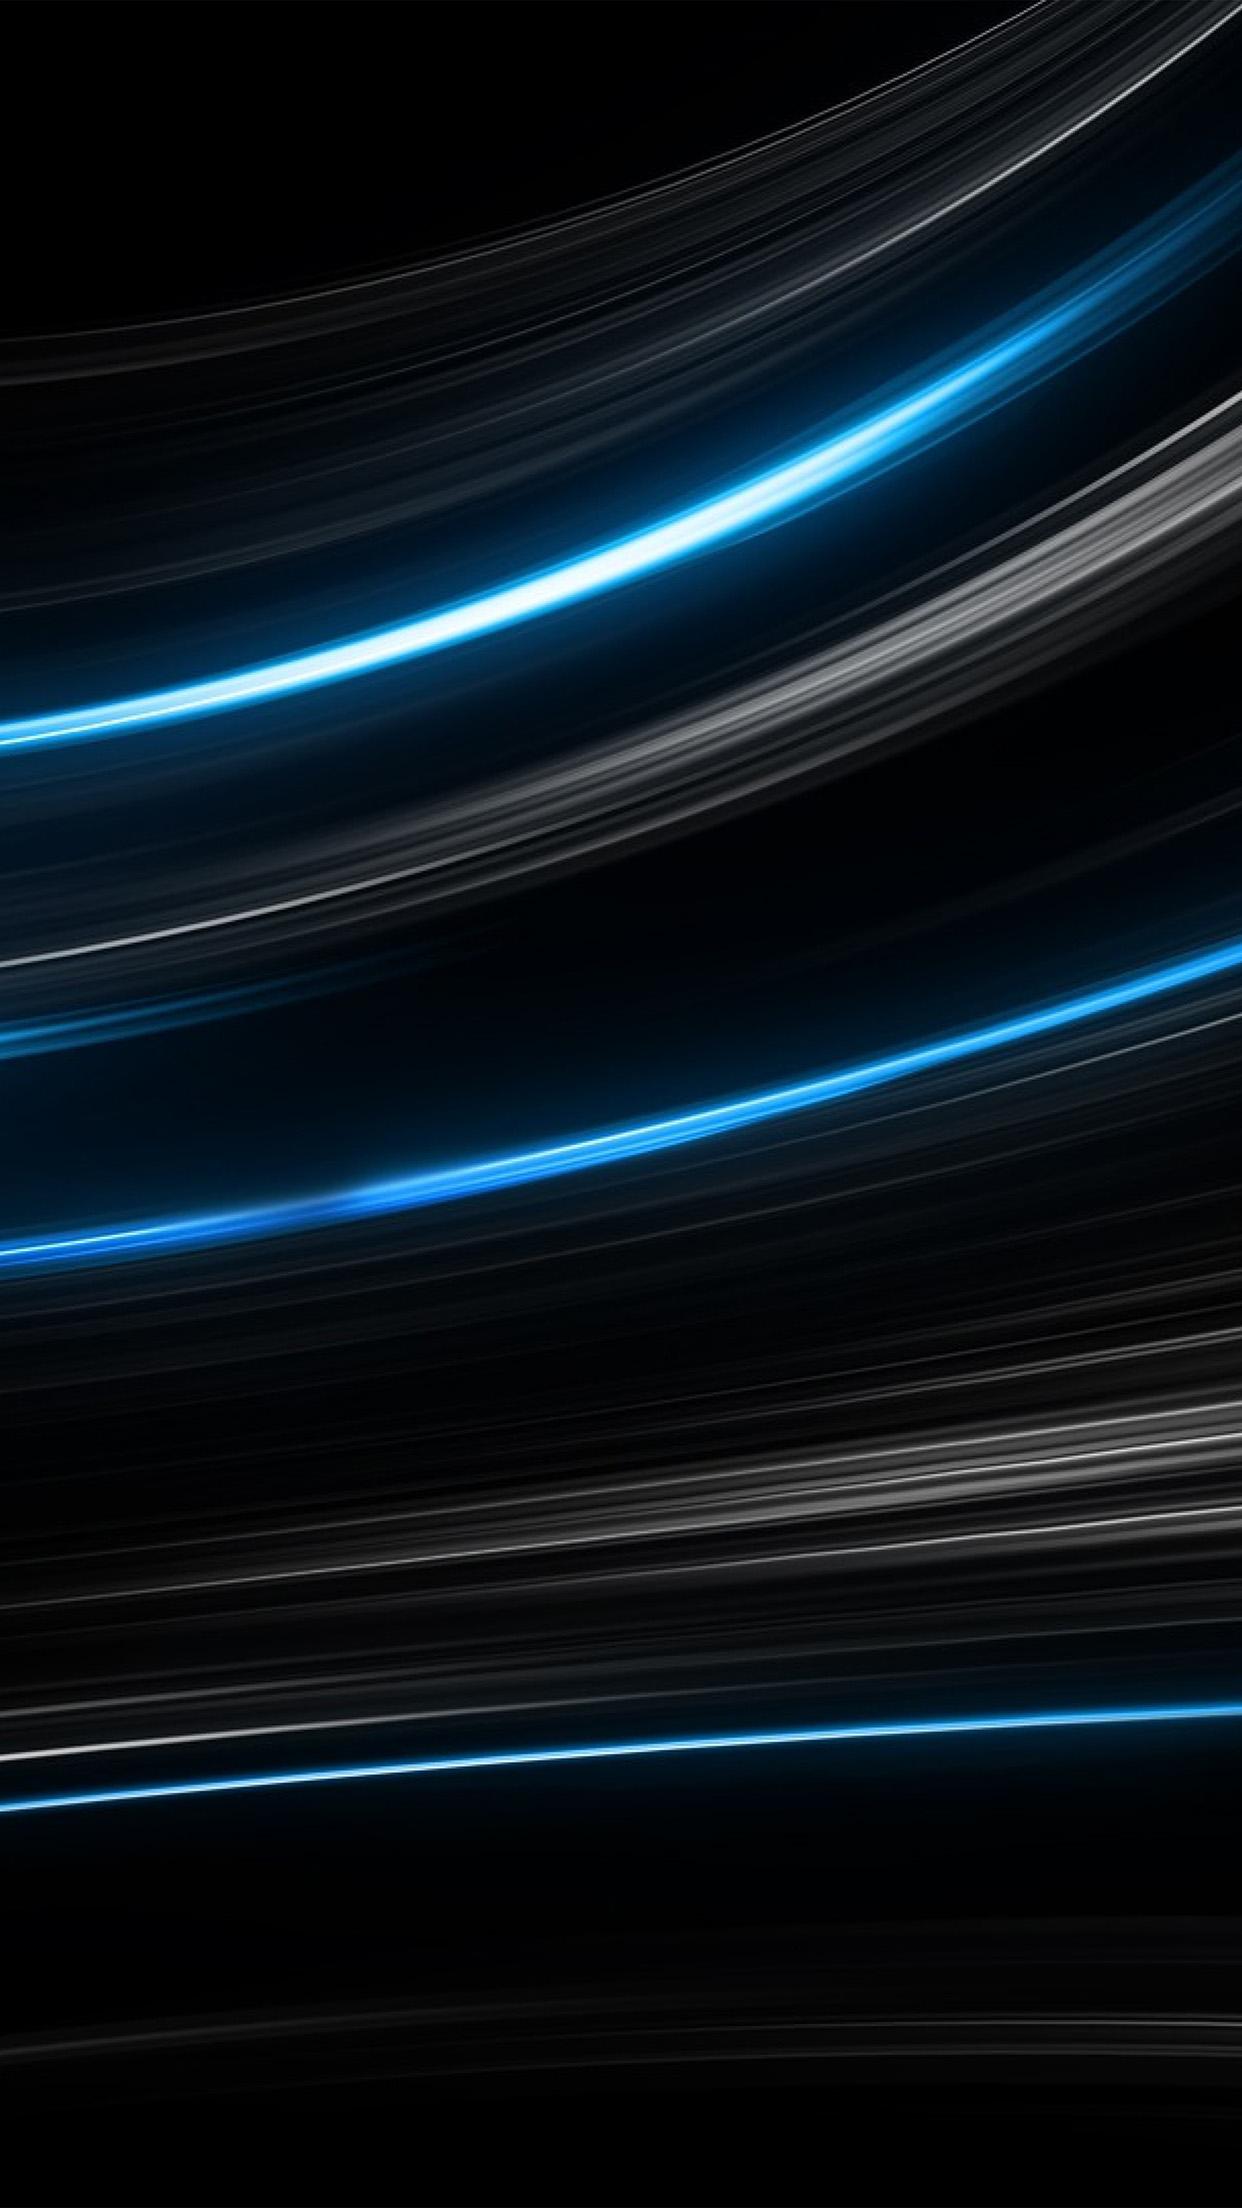 Dark Blue Wallpaper Android - 1242x2208 ...